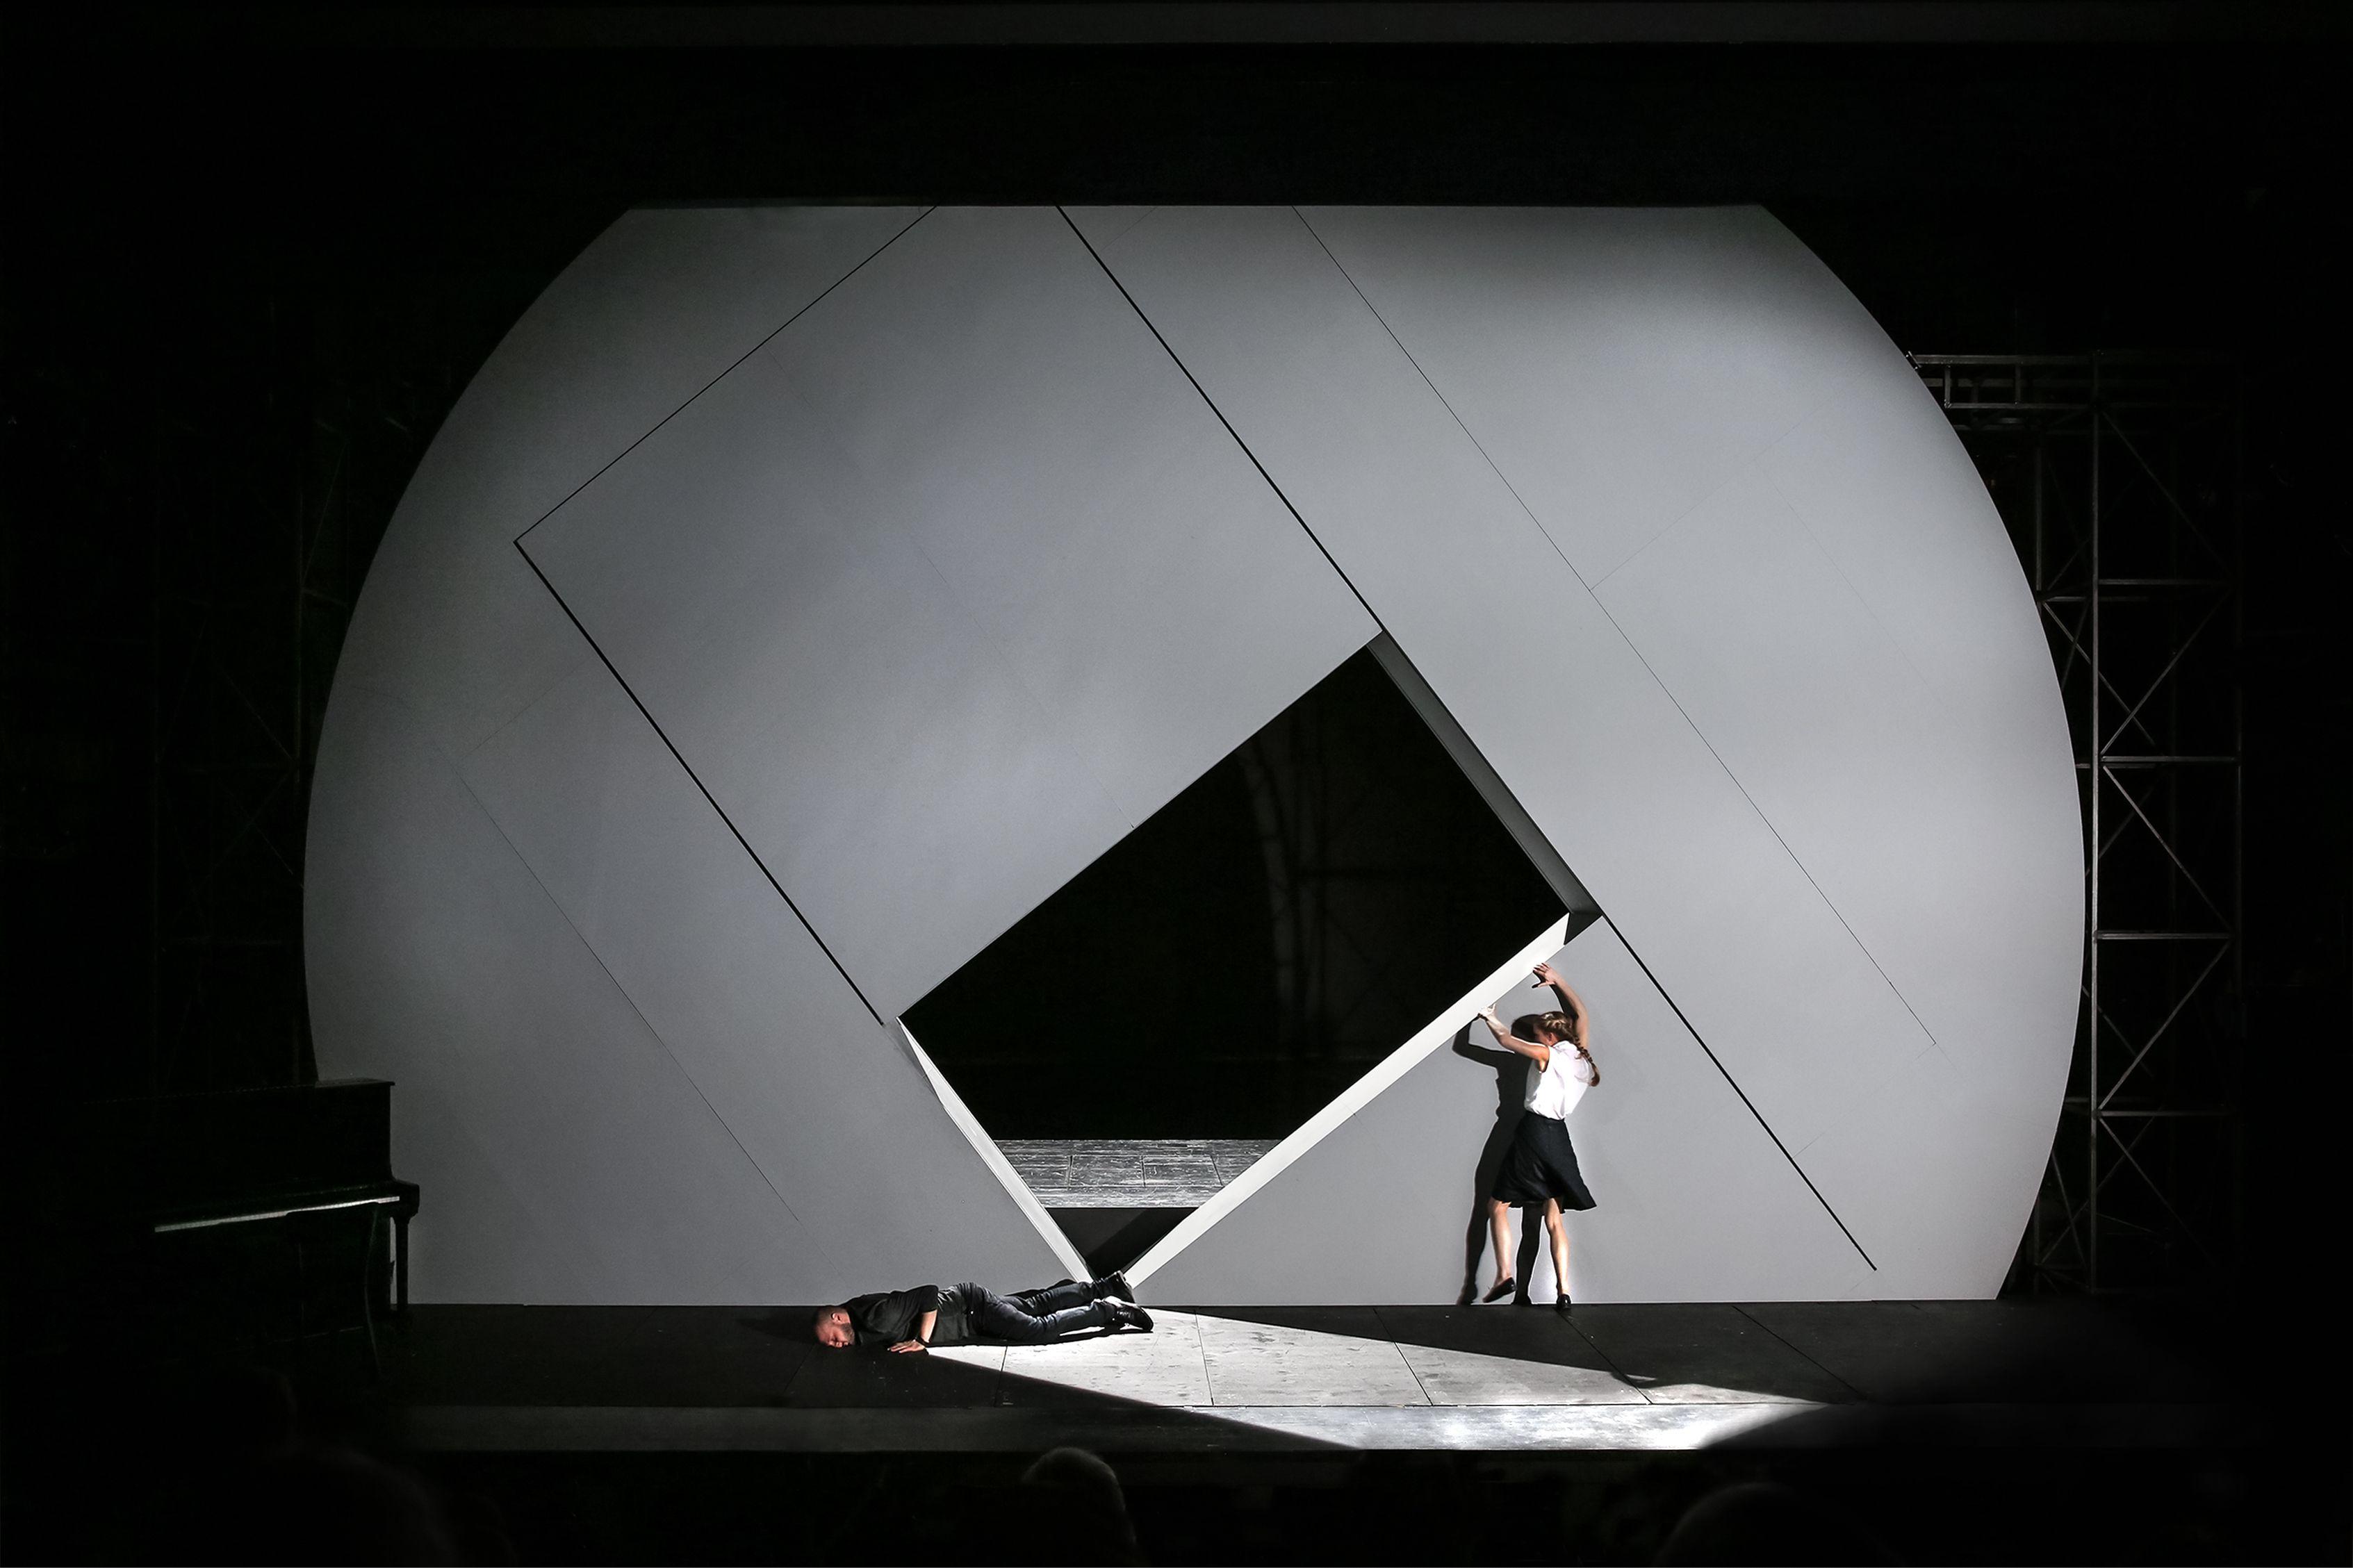 Design Bonn stagedesign for schillers kabale und liebe a play for theater bonn